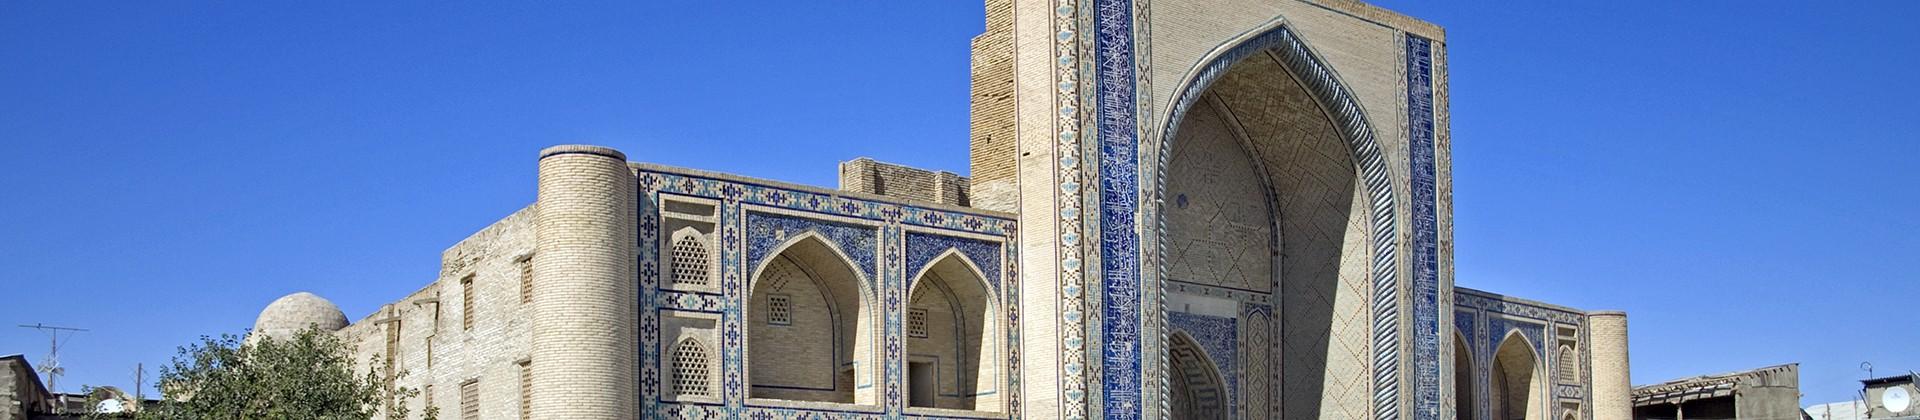 Legendary Uzbekistan Economy - 1